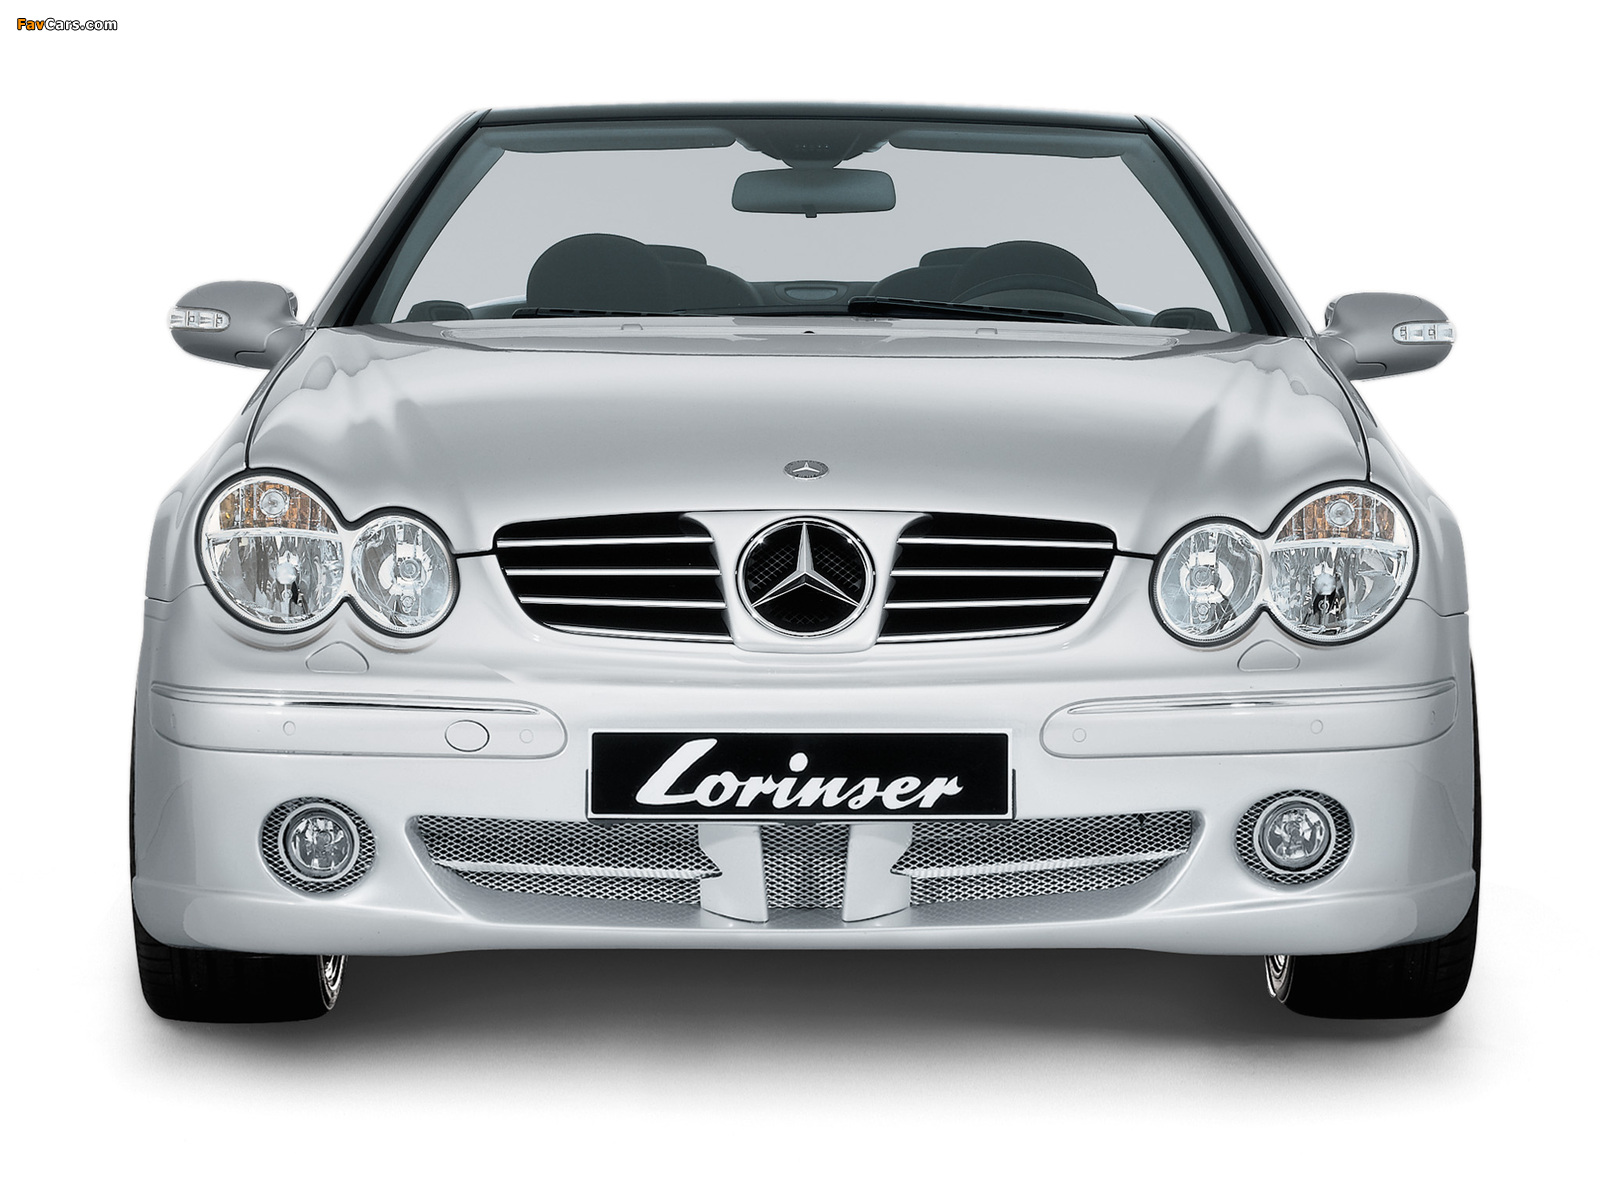 Pictures of Lorinser Mercedes-Benz CLK-Klasse (A209) (1600 x 1200)